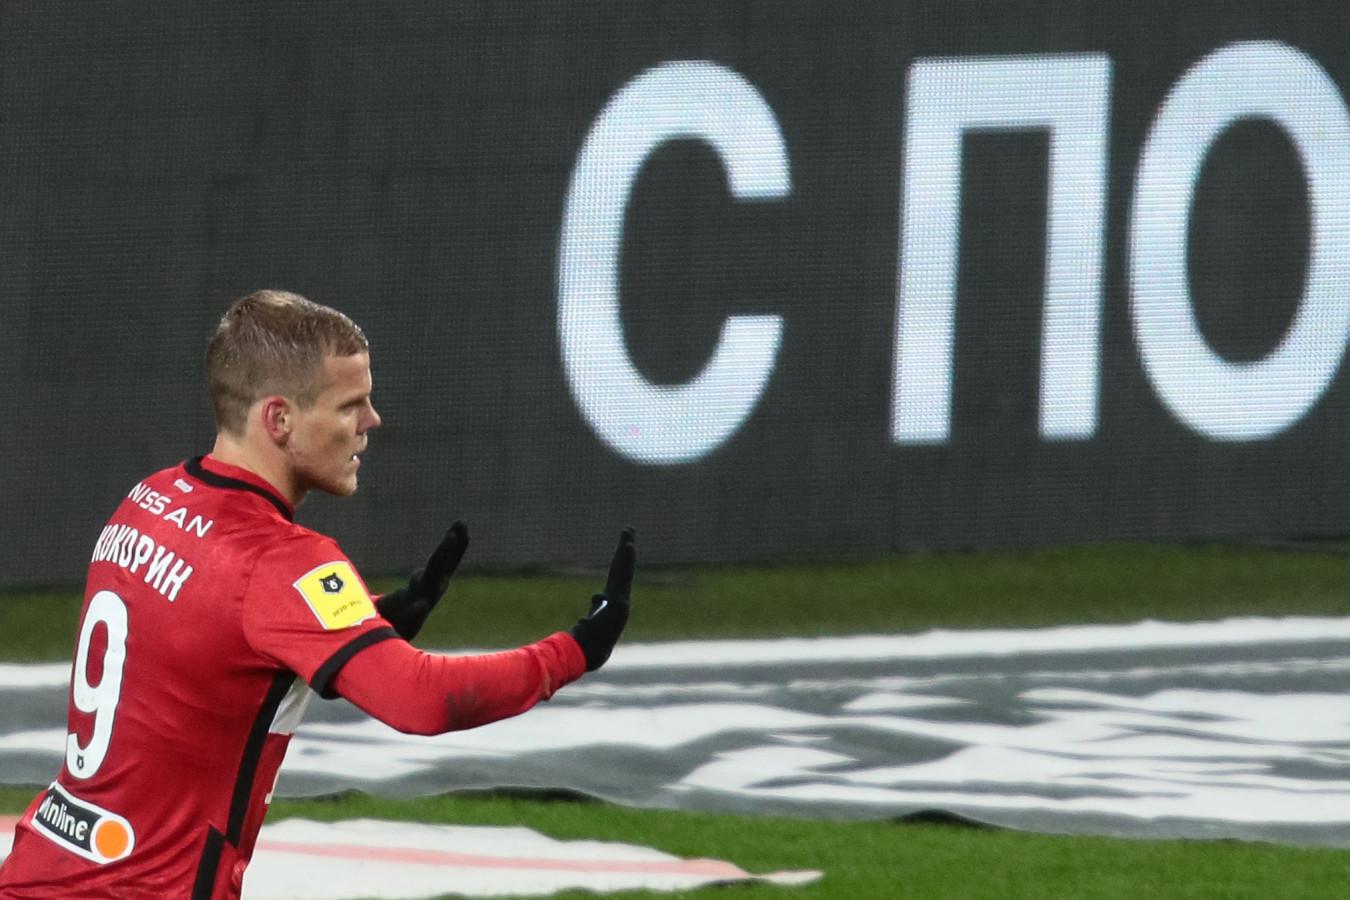 Гендиректор Рубина прокомментировал слухи об интересе клуба к Александру Кокорину